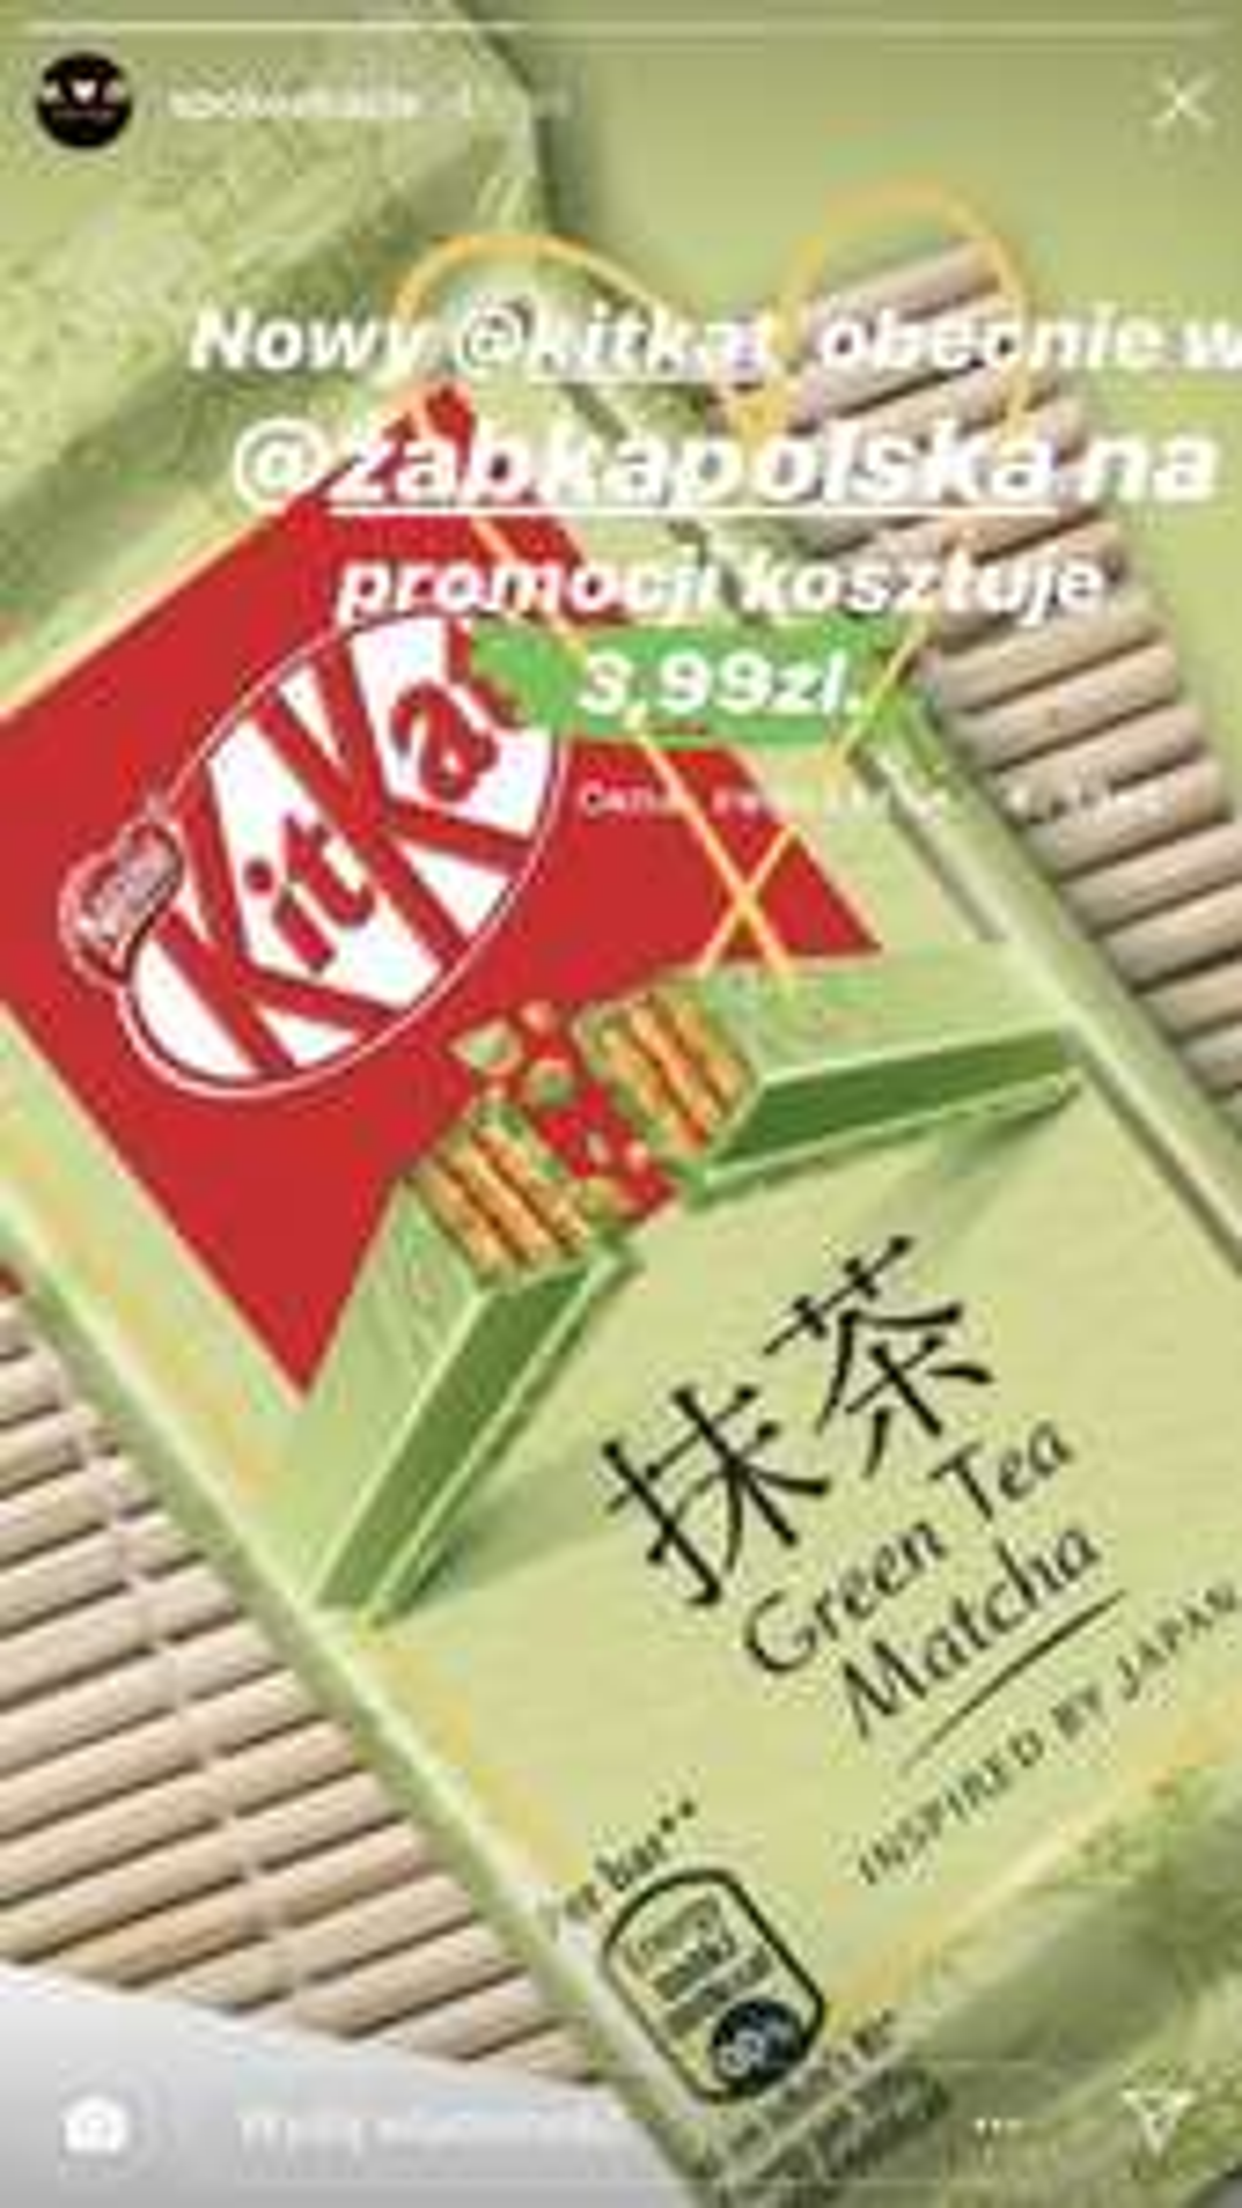 kit kat zielona herbata w żabce promocja ogólnopolska